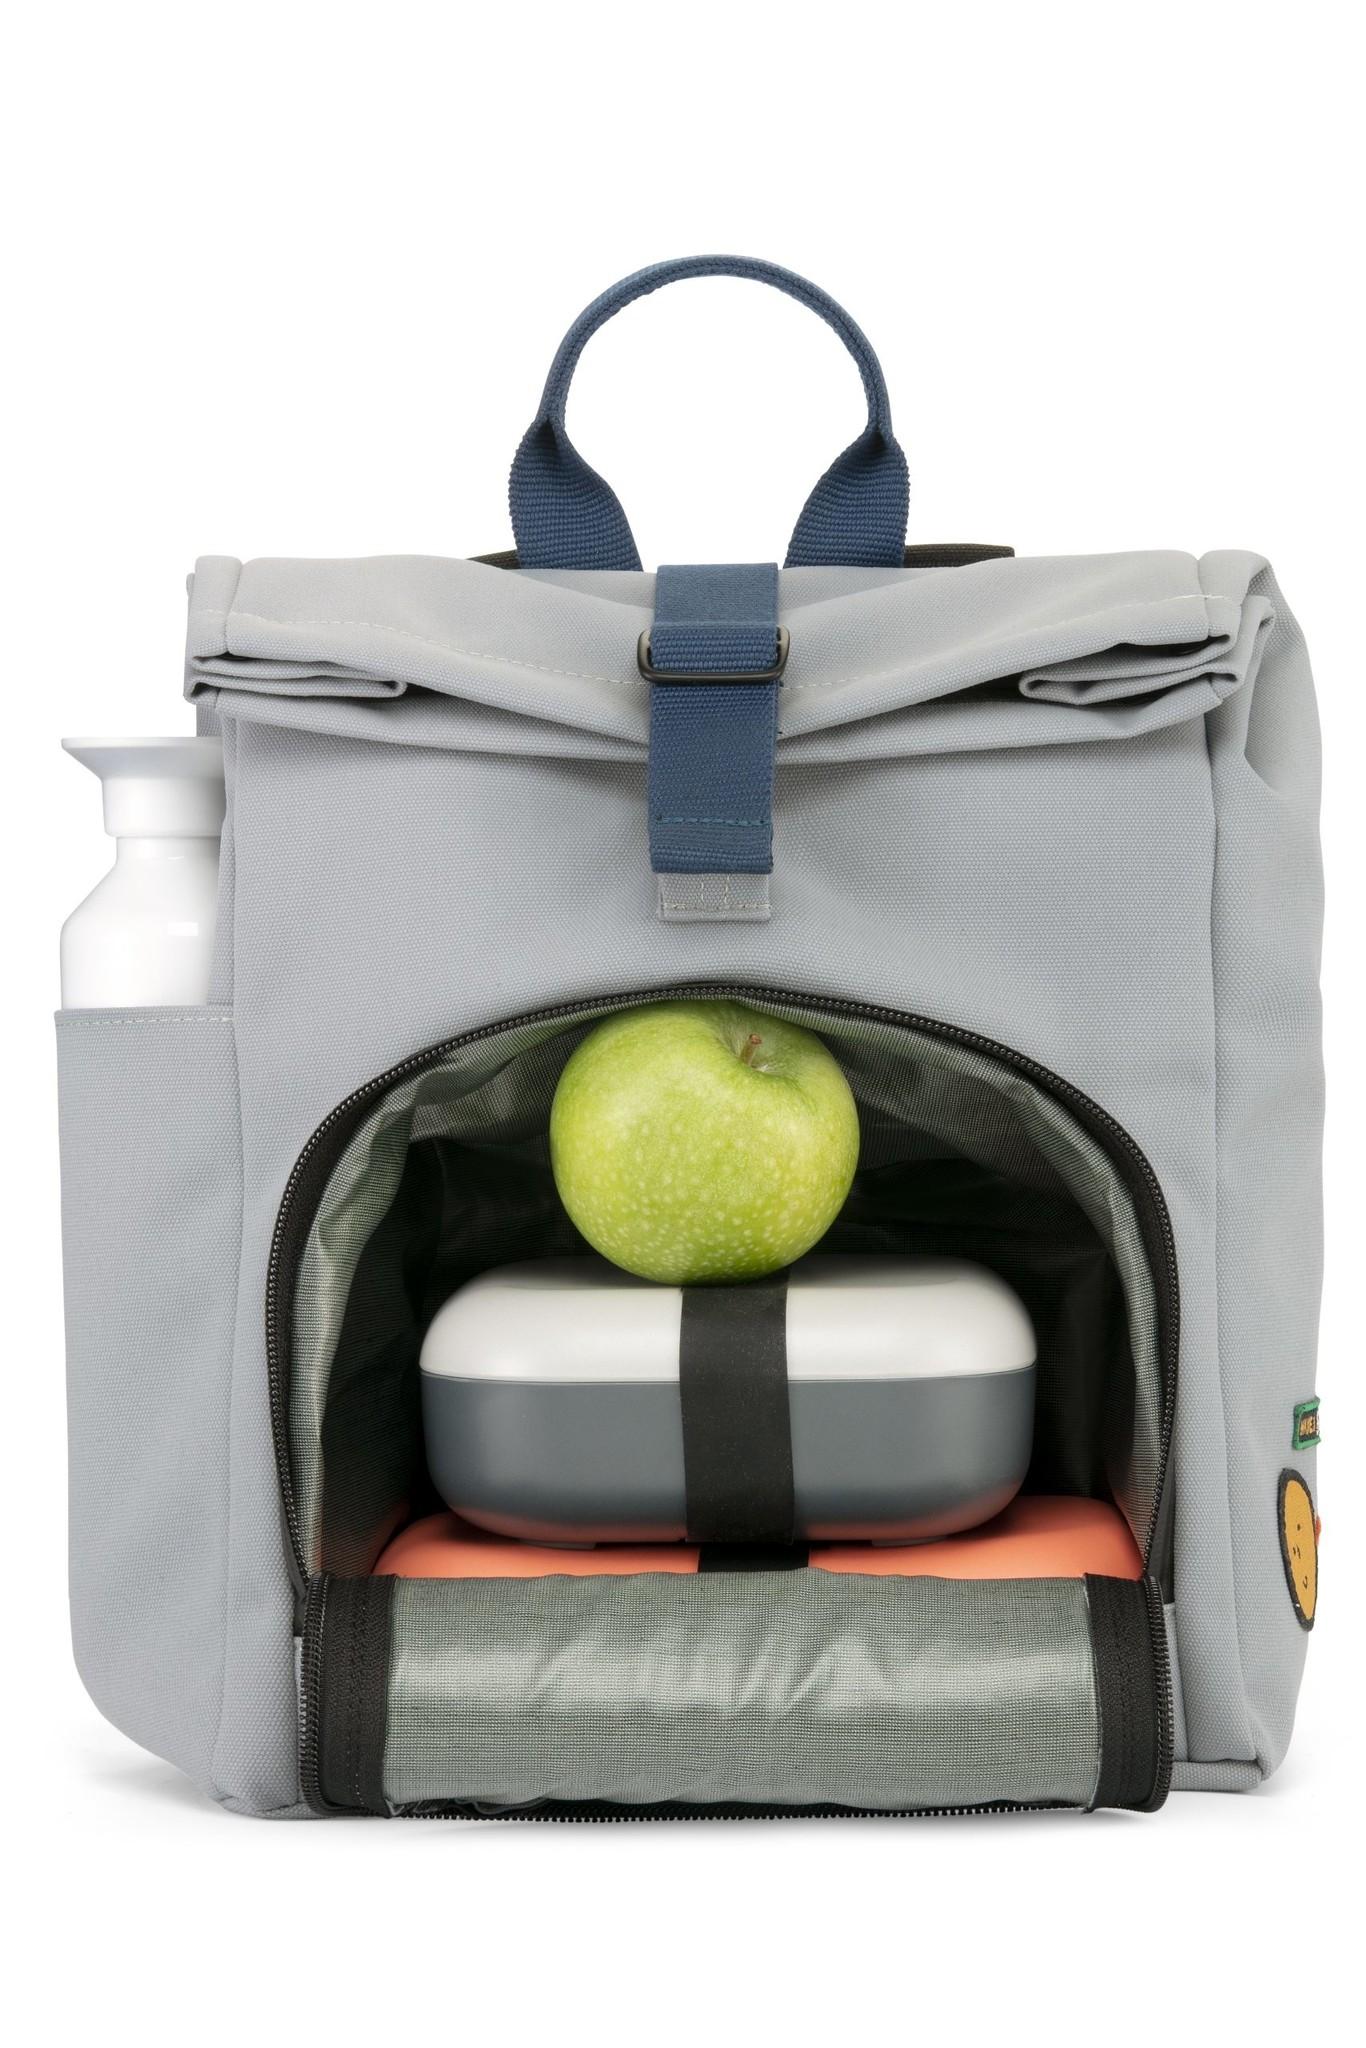 Mini Bag - Cloud grey / Ocean Blue-2